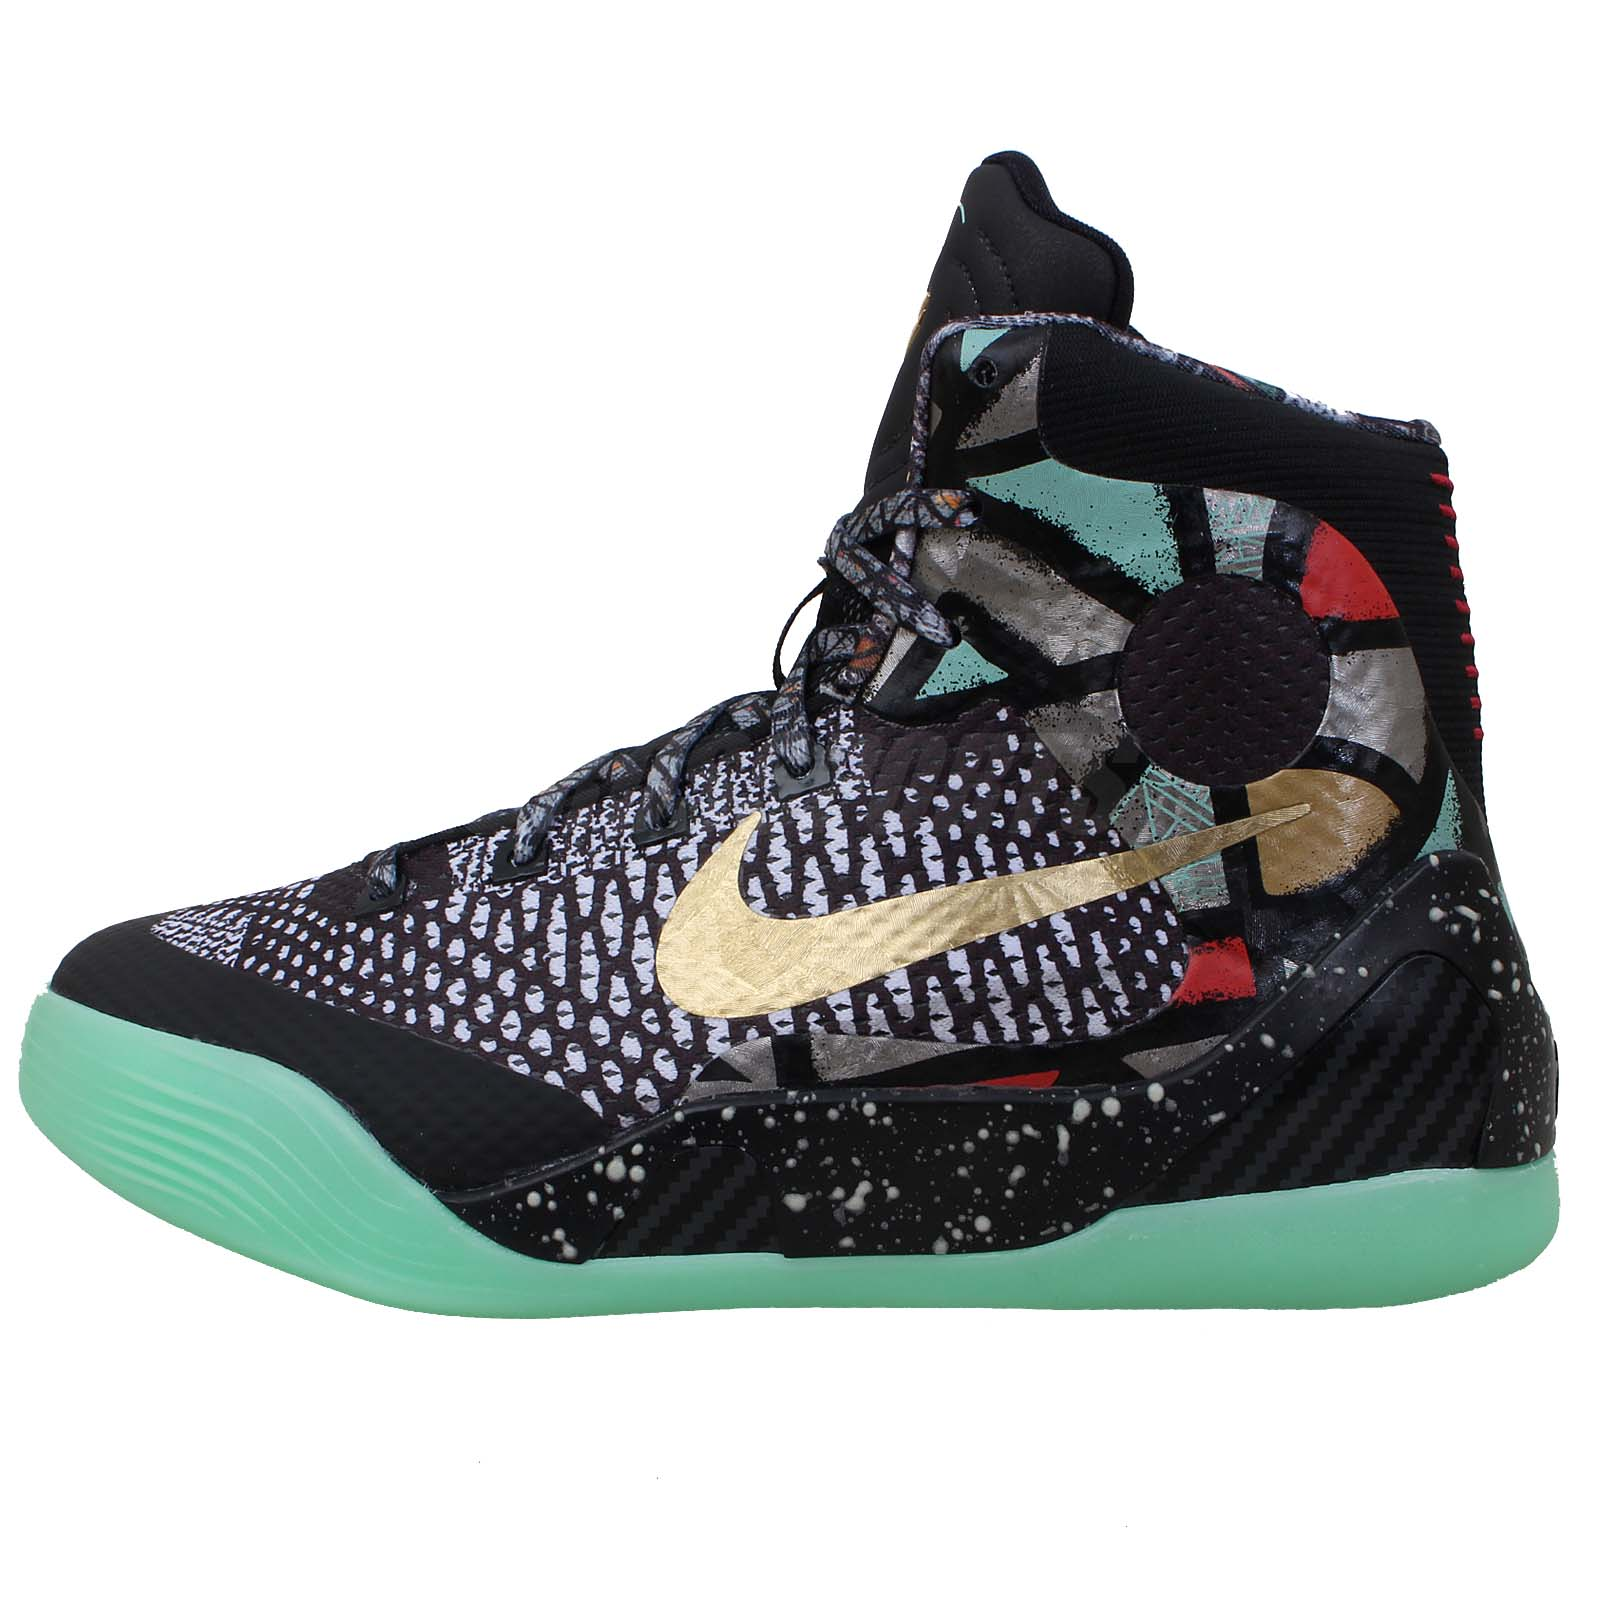 Clearance Basketball Shoes Australia